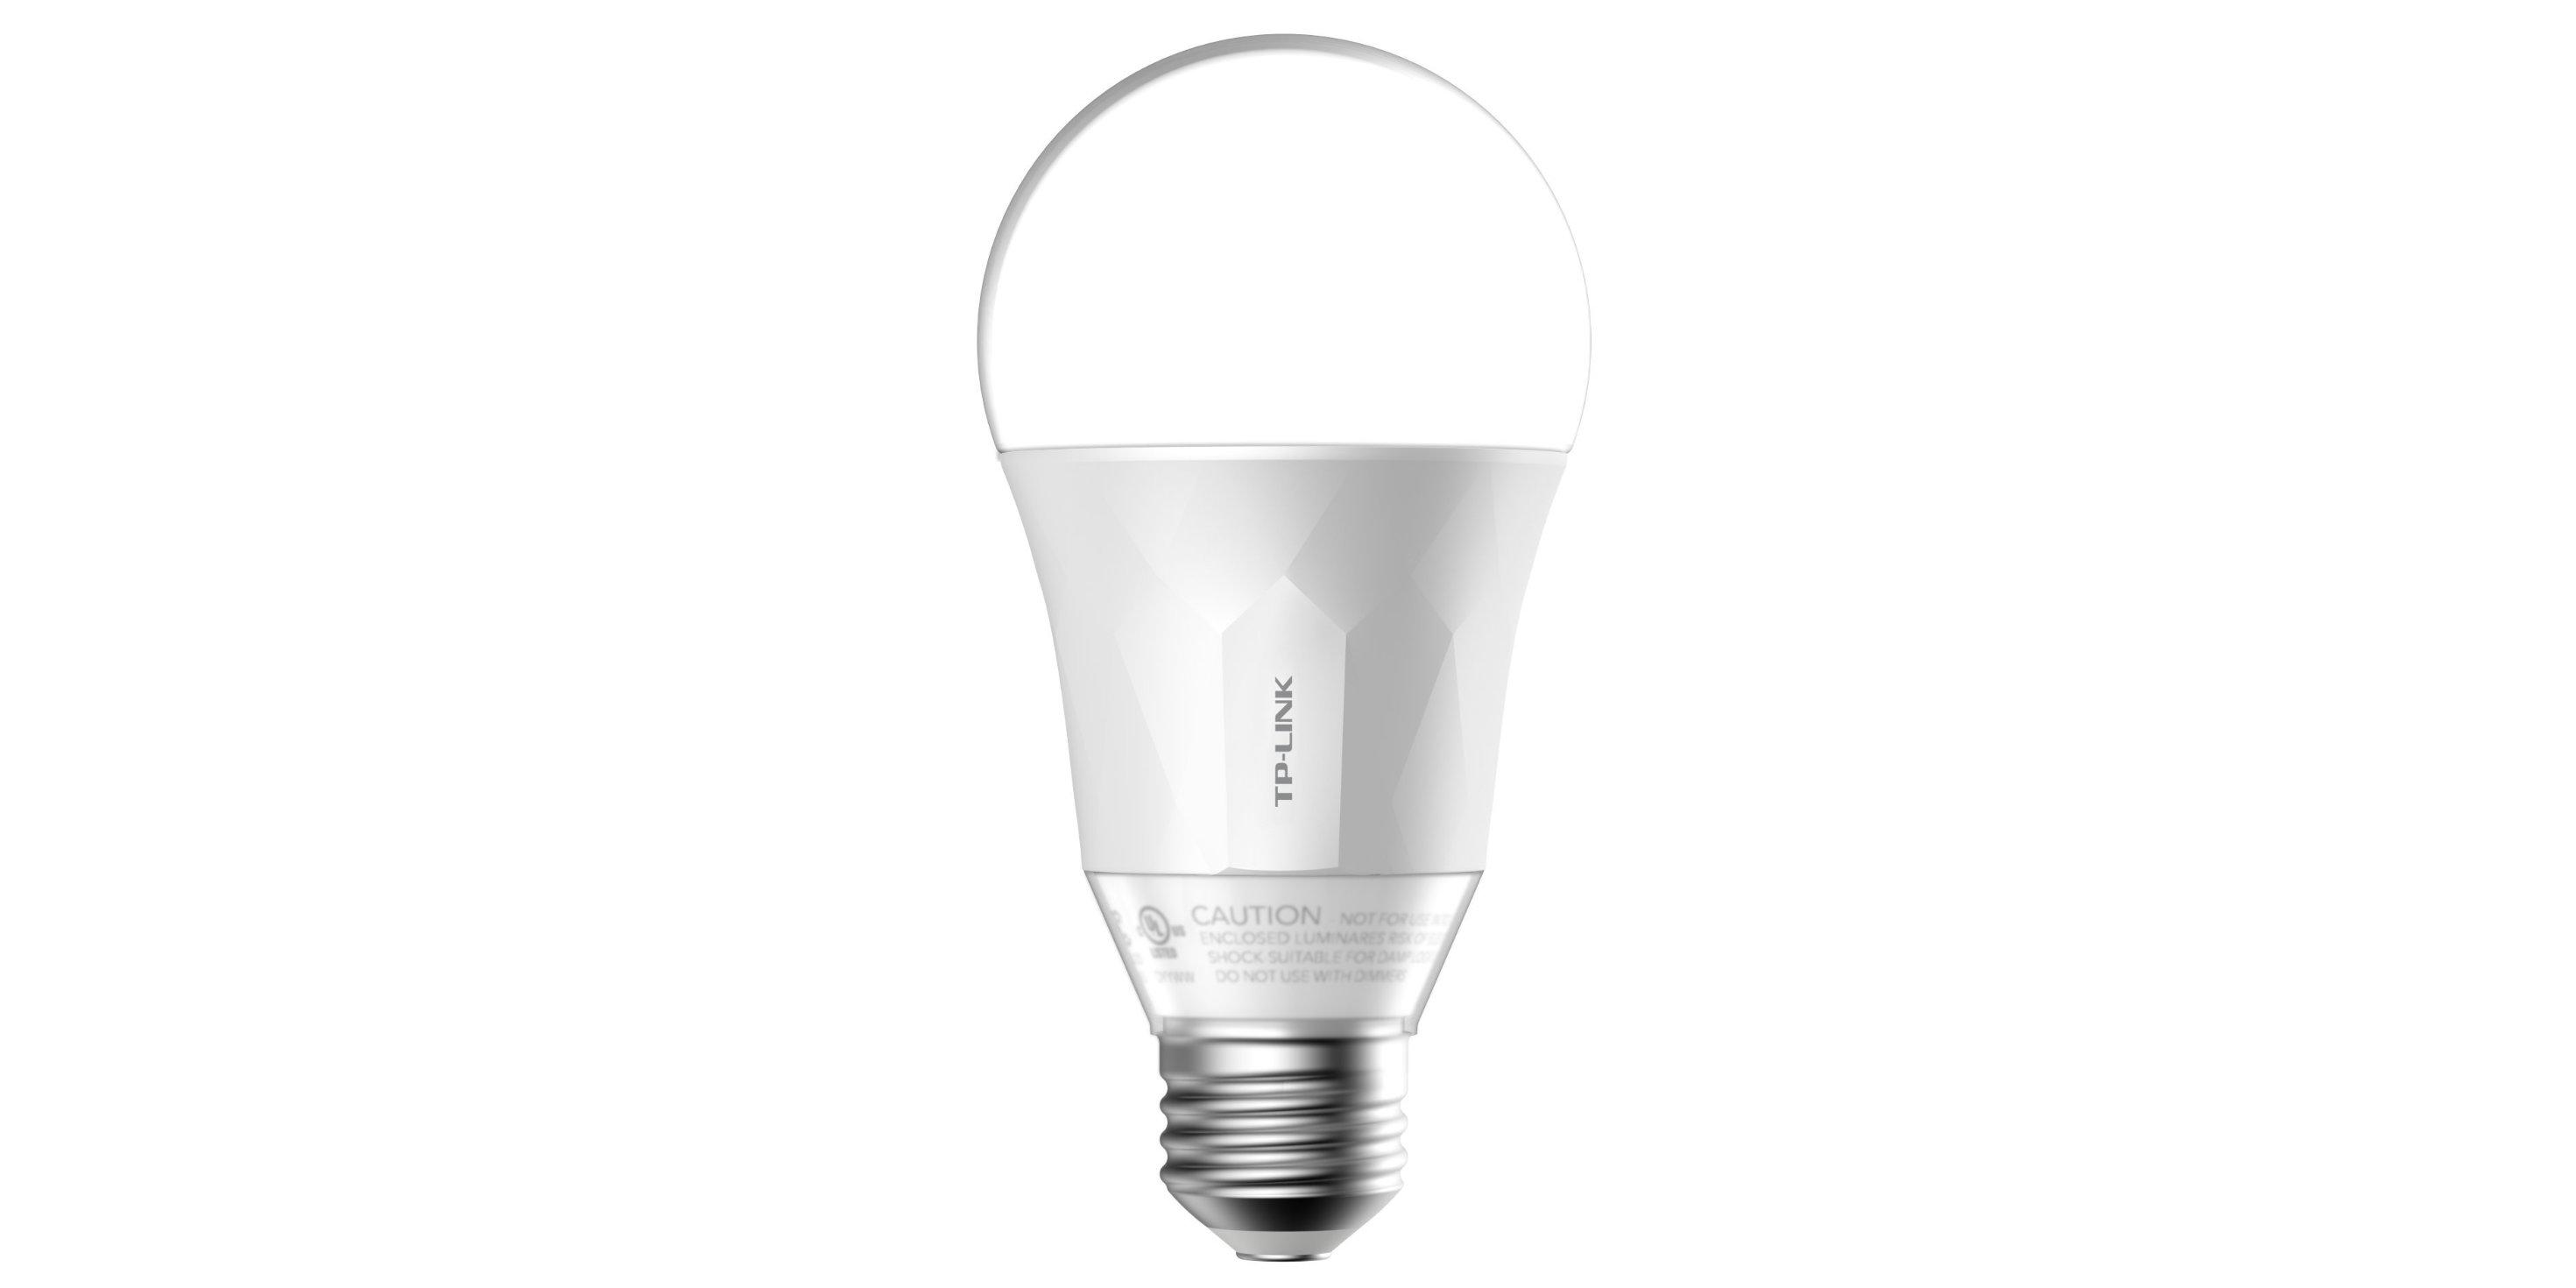 tp-link-led-light-bulb